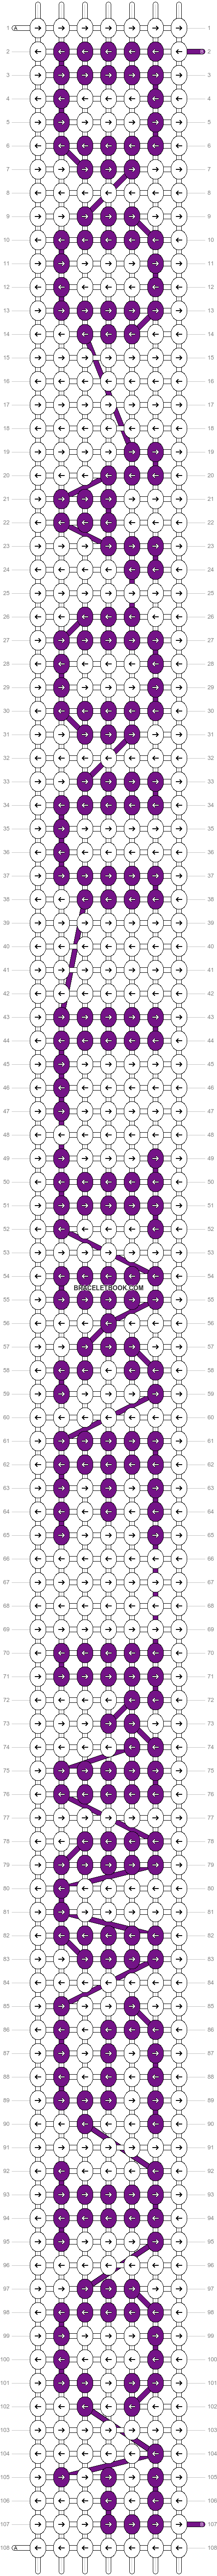 Alpha pattern #5789 pattern